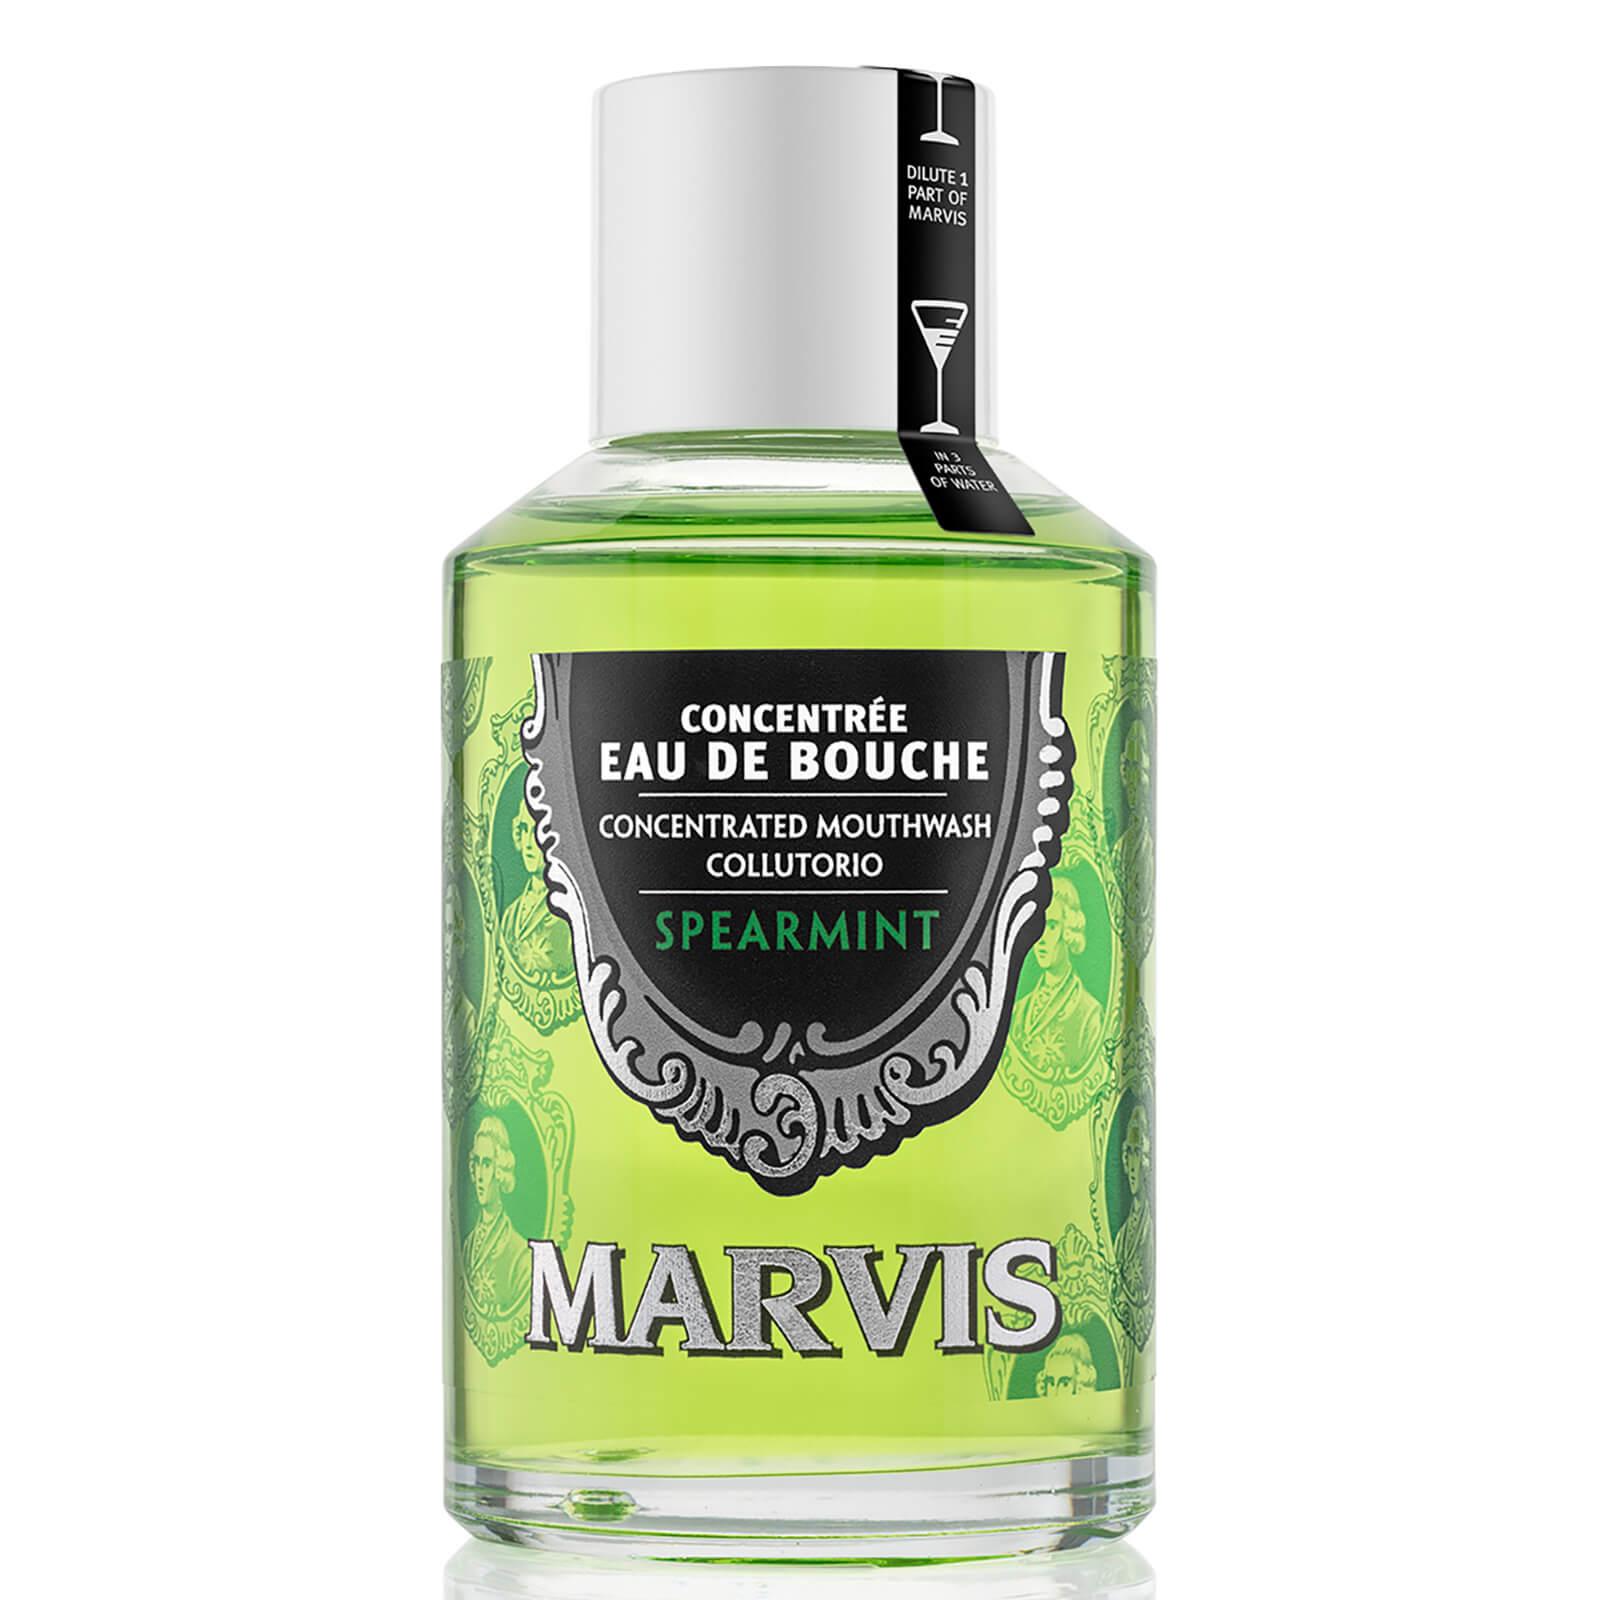 Marvis 薄荷浓缩漱口水 120ml